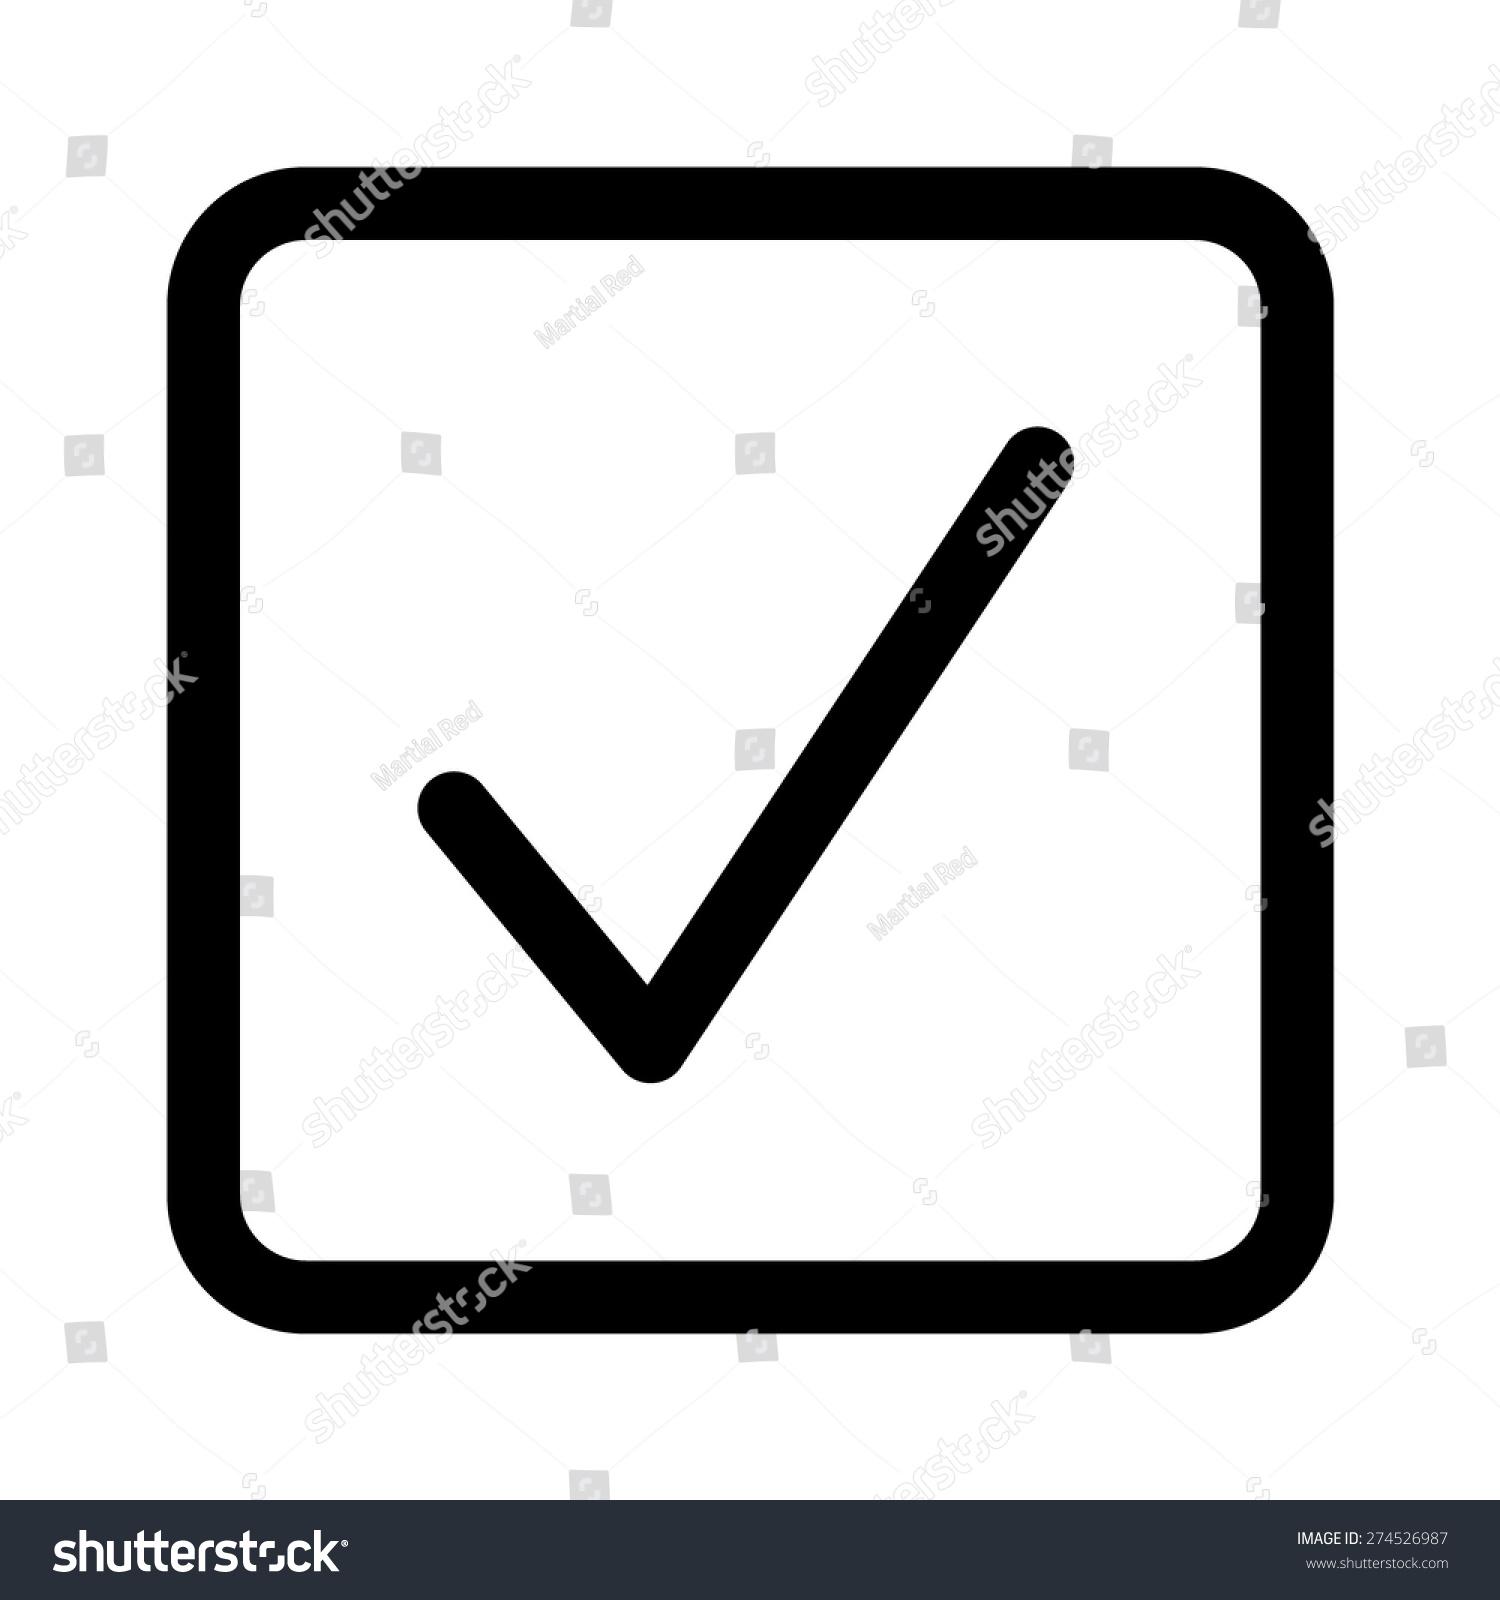 Square checkbox check box line art stock vector 274526987 square checkbox or check box line art icon for apps and websites biocorpaavc Gallery